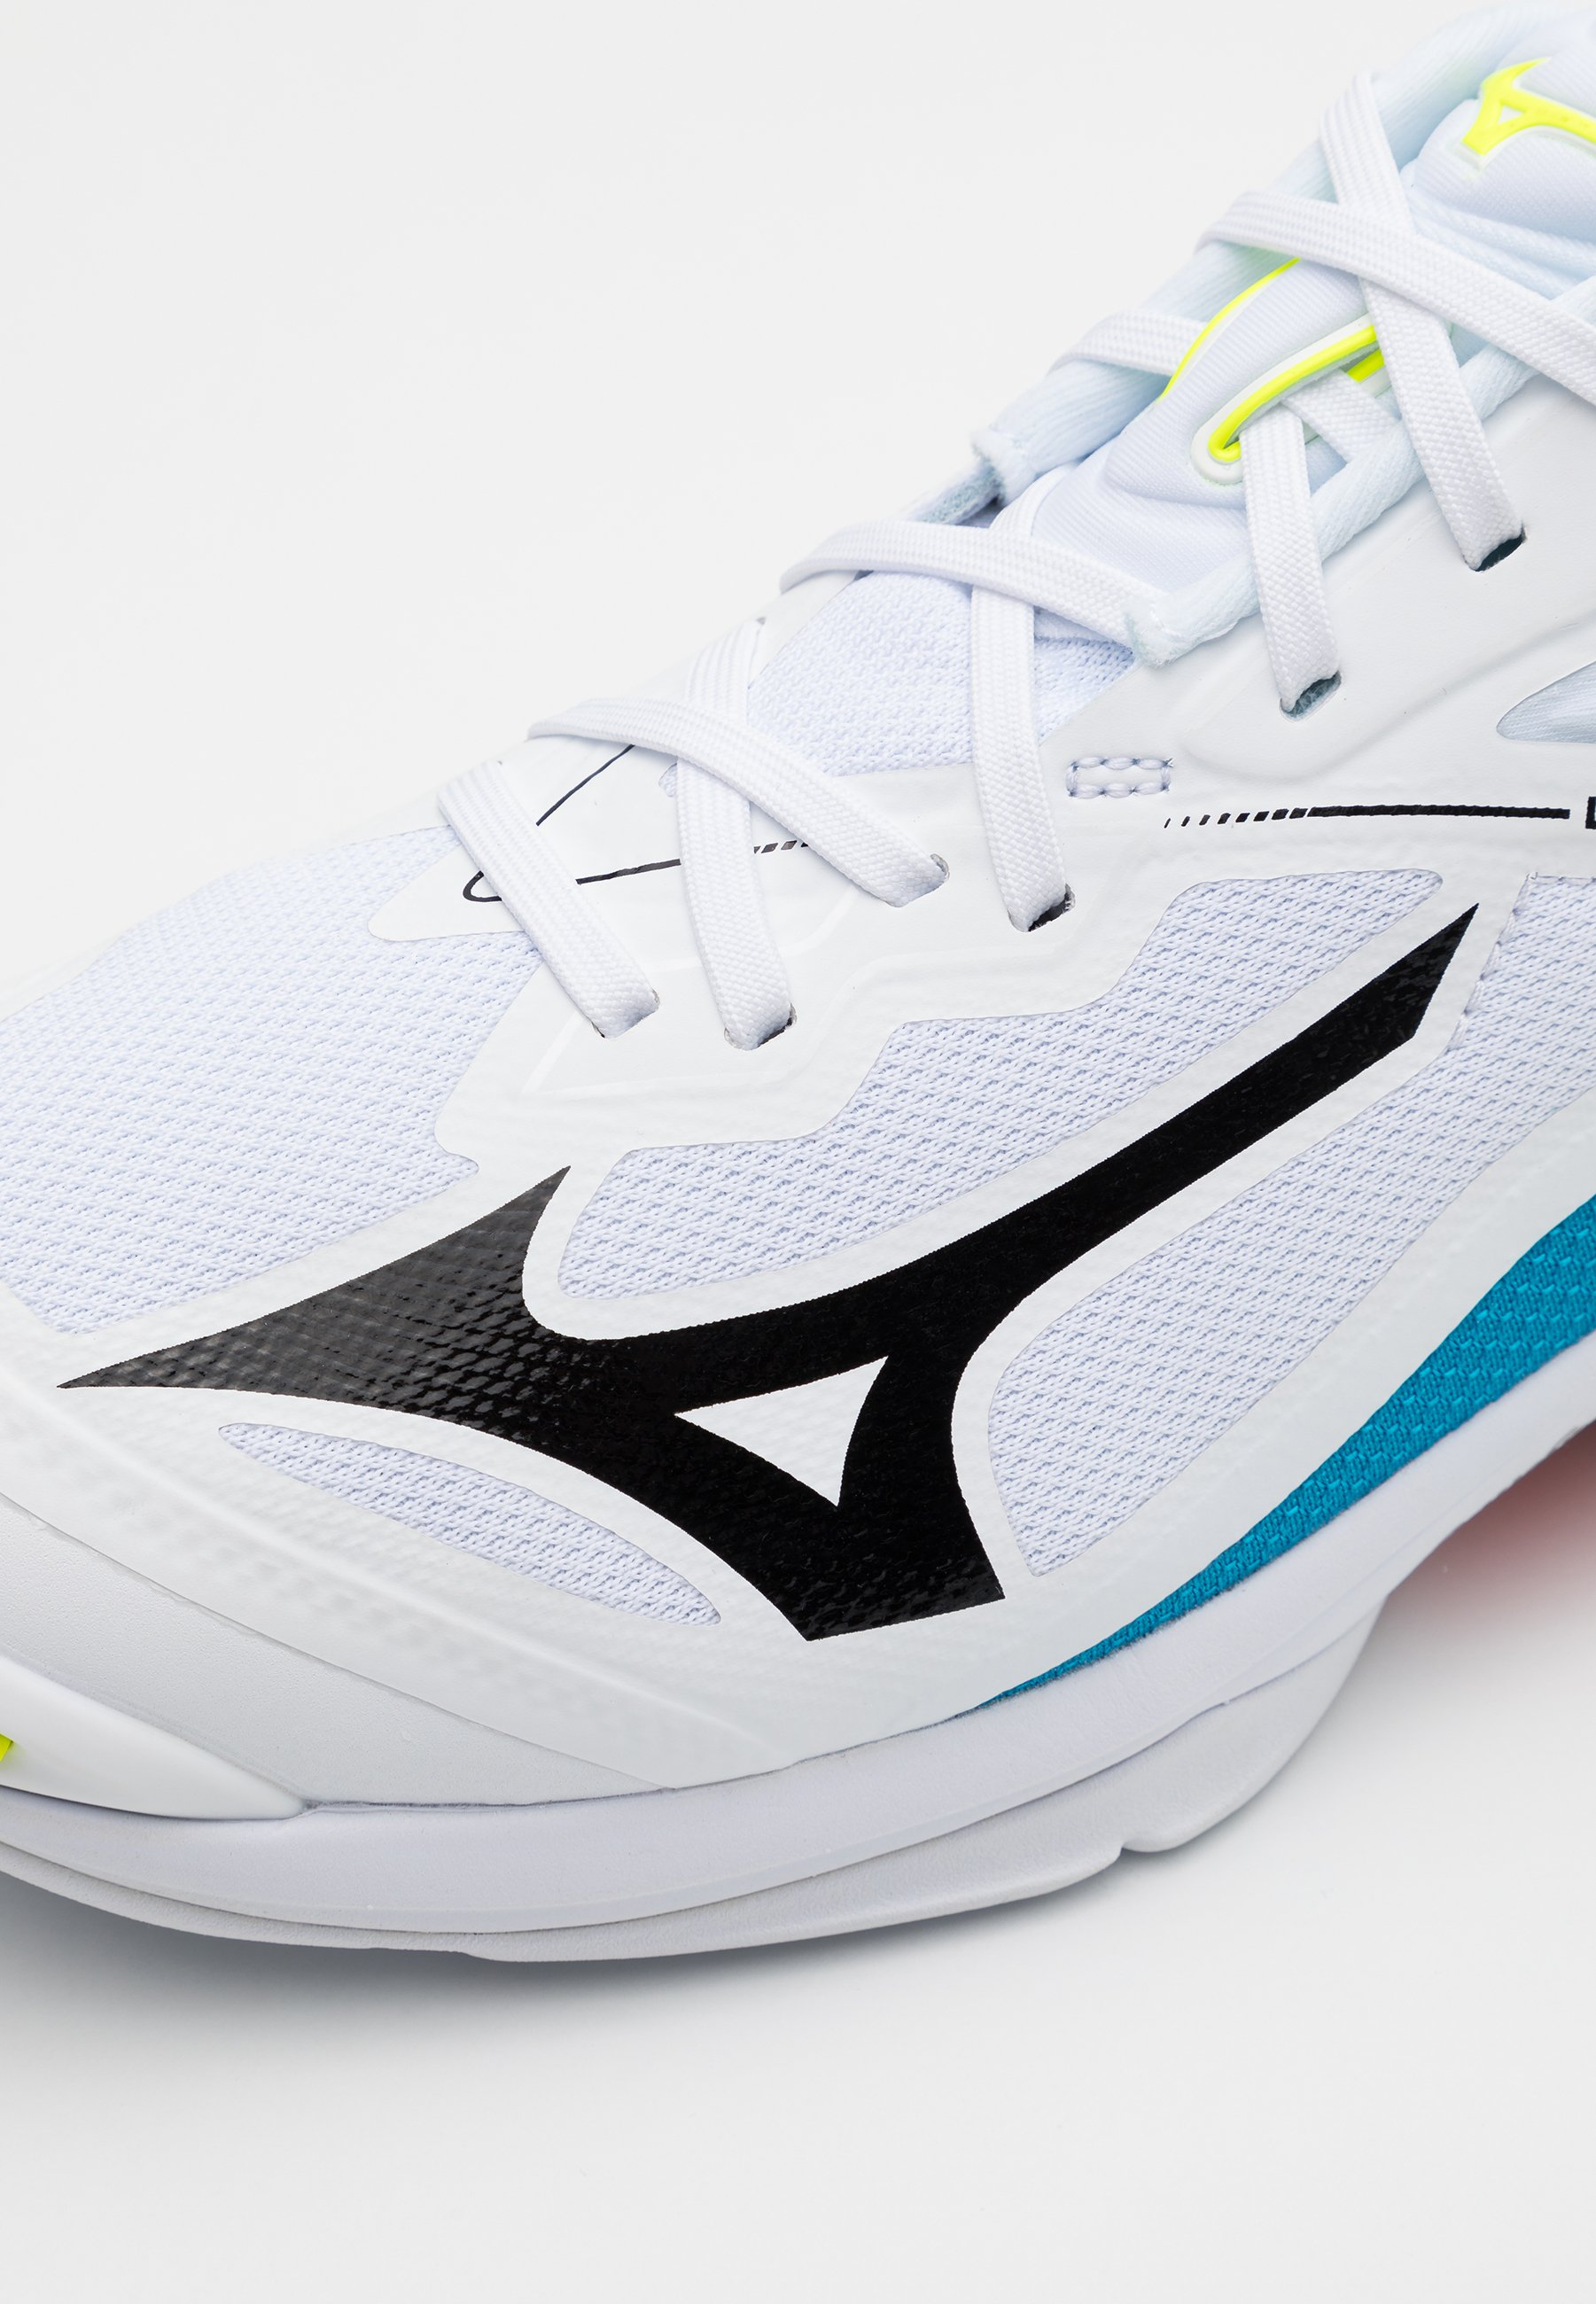 zapatillas balonmano mizuno zalando blancas